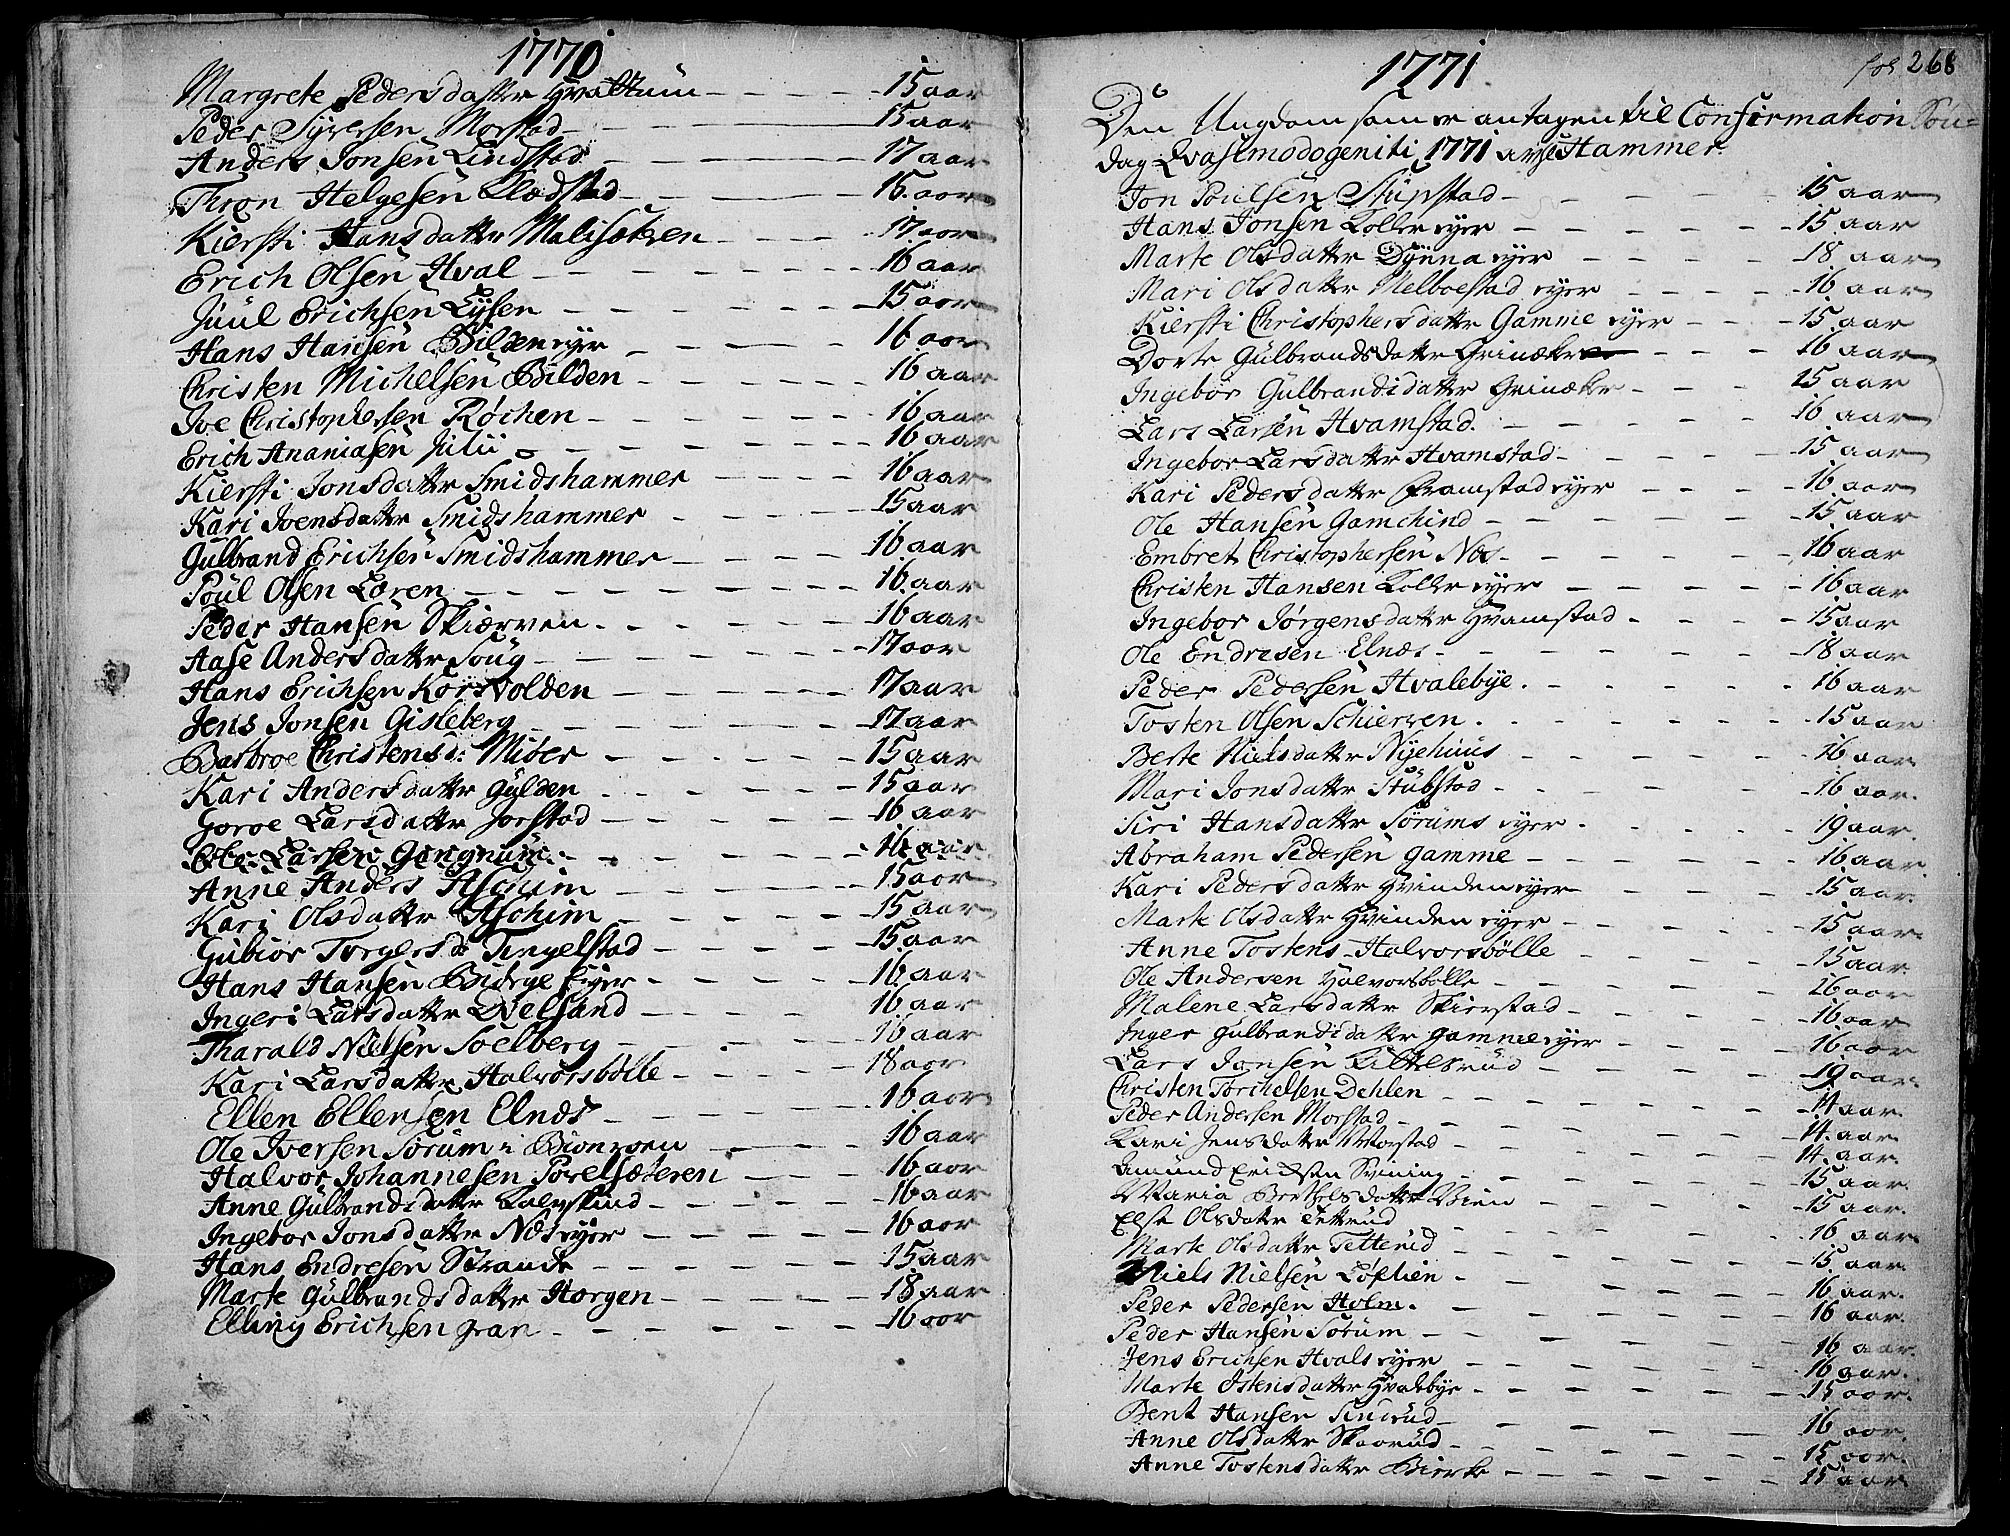 SAH, Gran prestekontor, Ministerialbok nr. 4, 1759-1775, s. 268